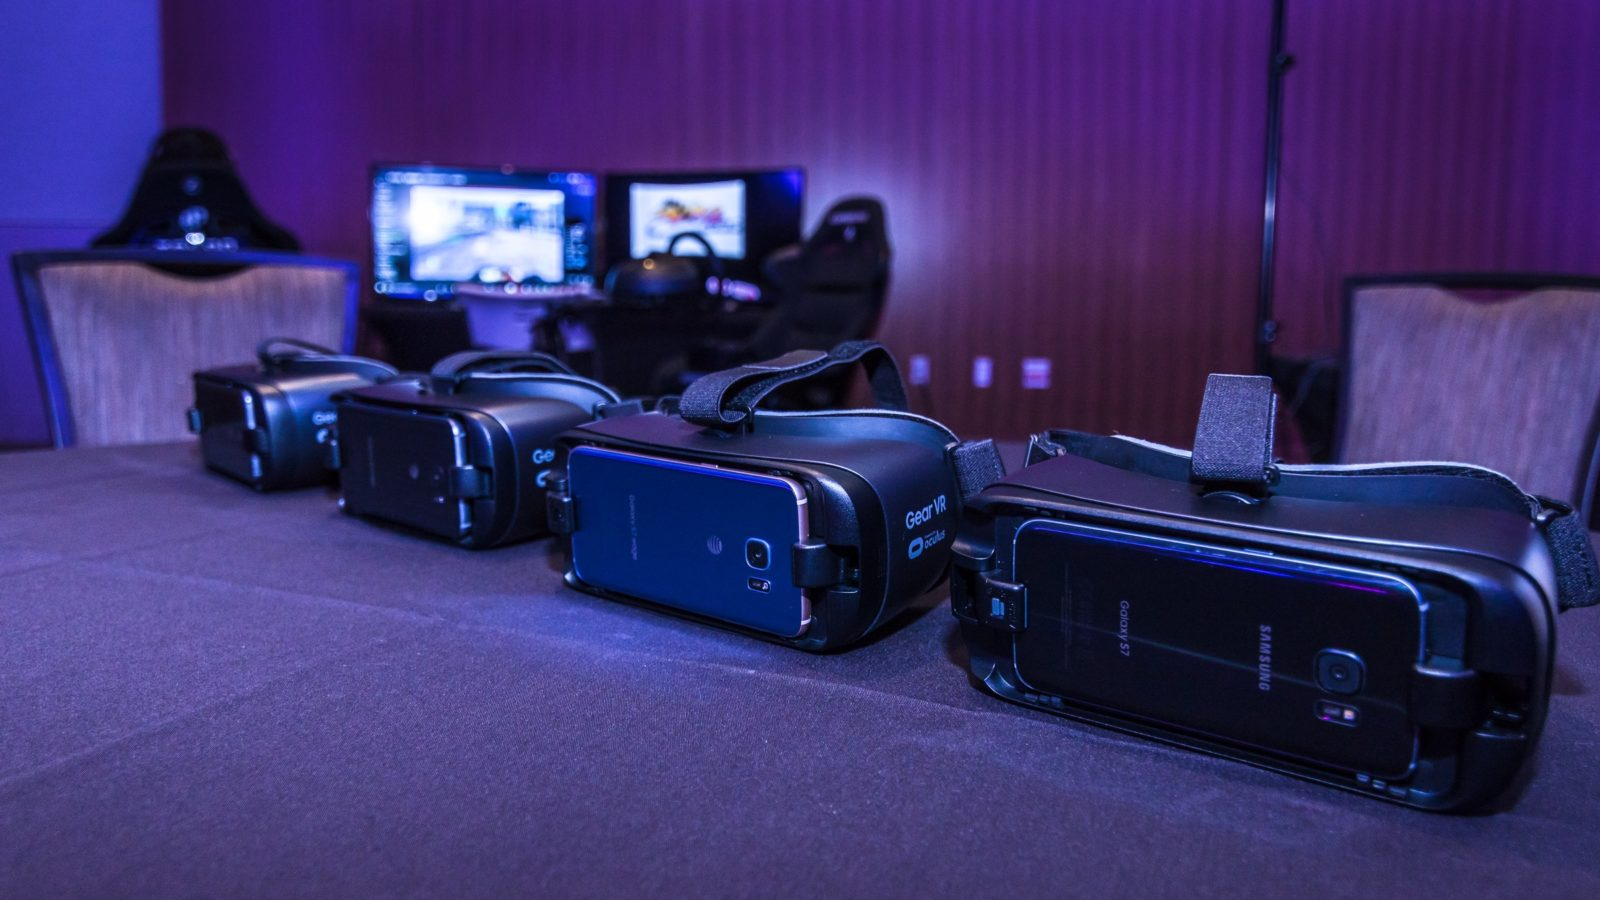 Oculus Go VR Stations